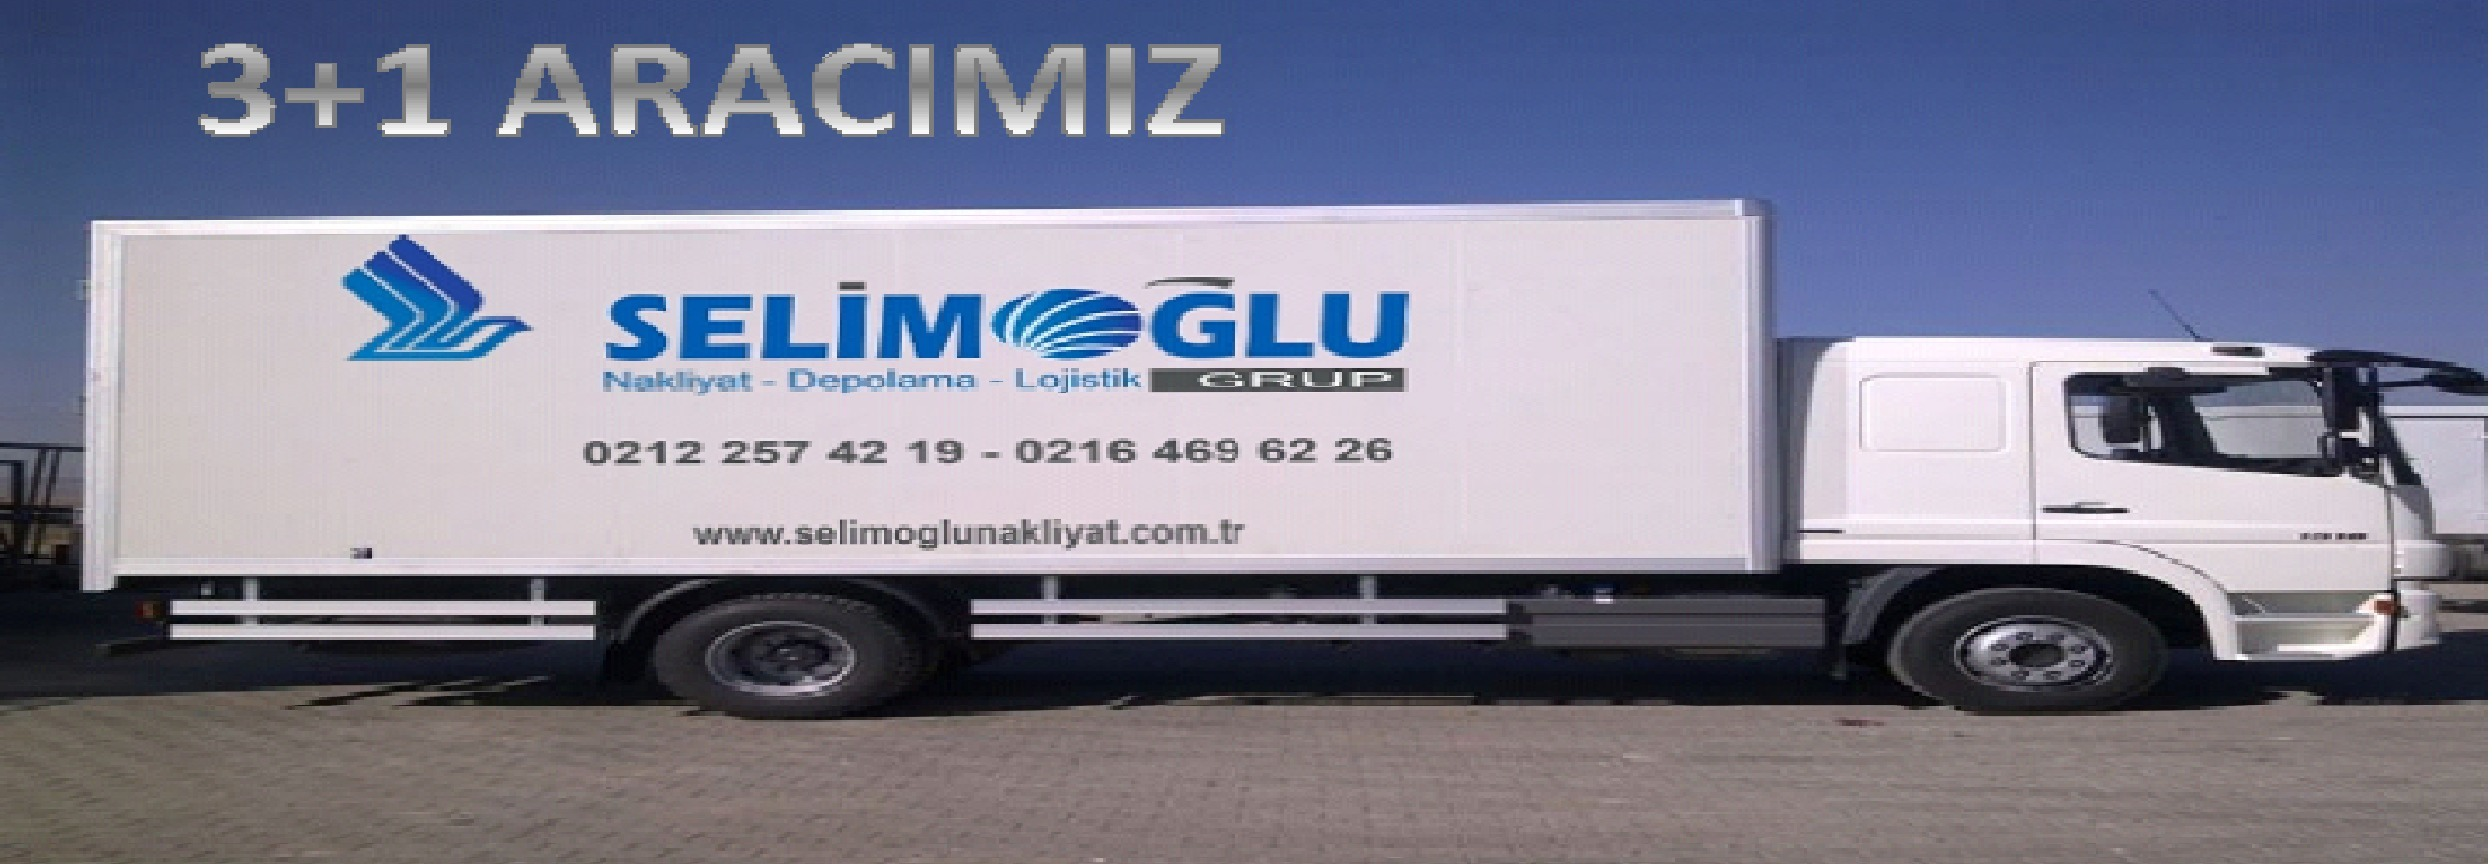 Selimoğlu Nakli (@ismail36) Cover Image